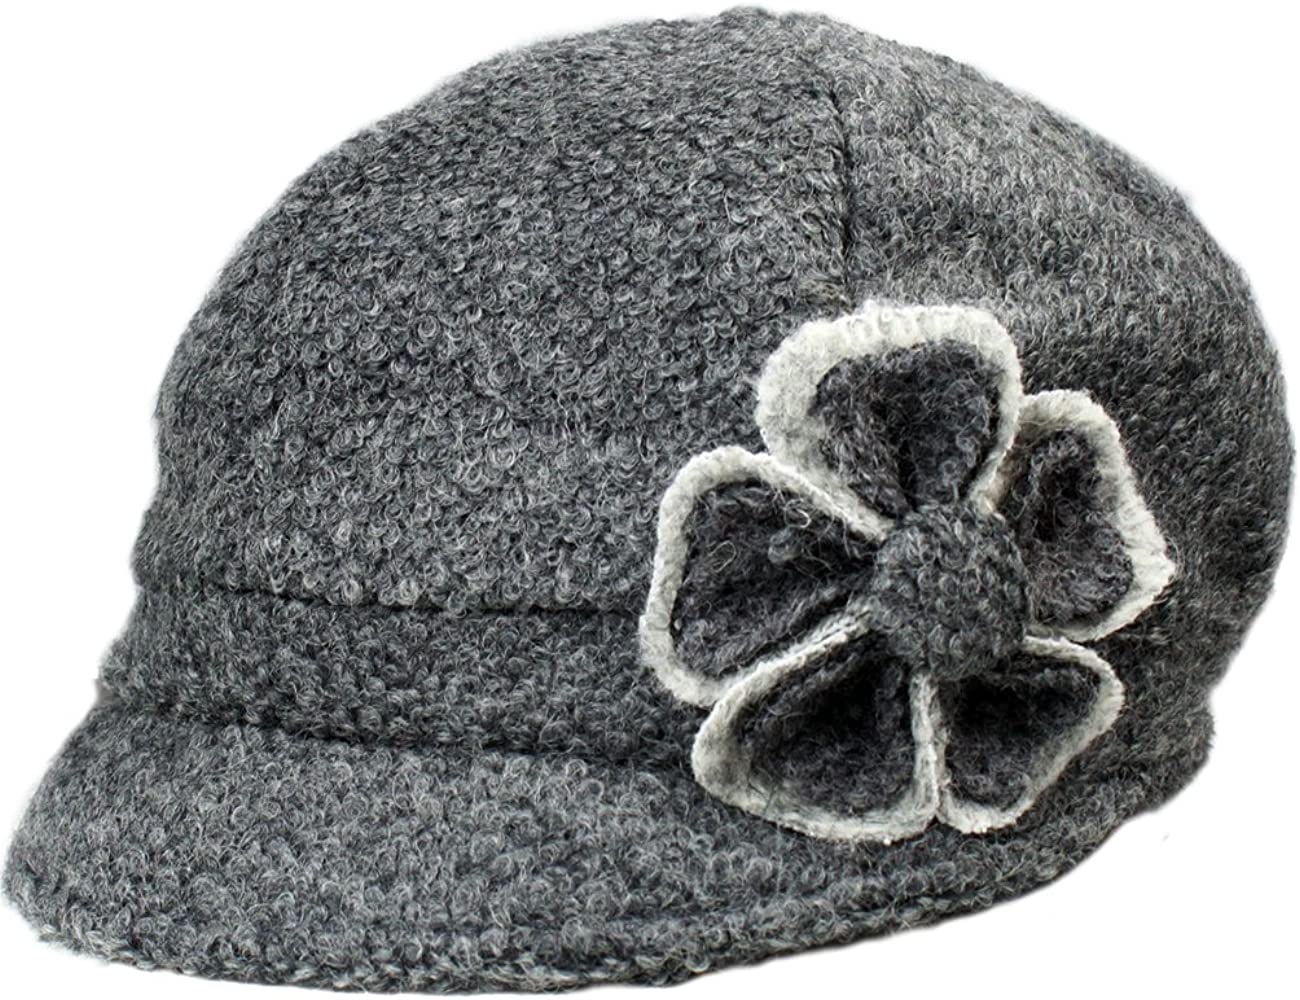 Dahlia Women's Chic Max 88% OFF Flower Newsboy Cap Tucson Mall Lay Blend Dual - Wool Hat